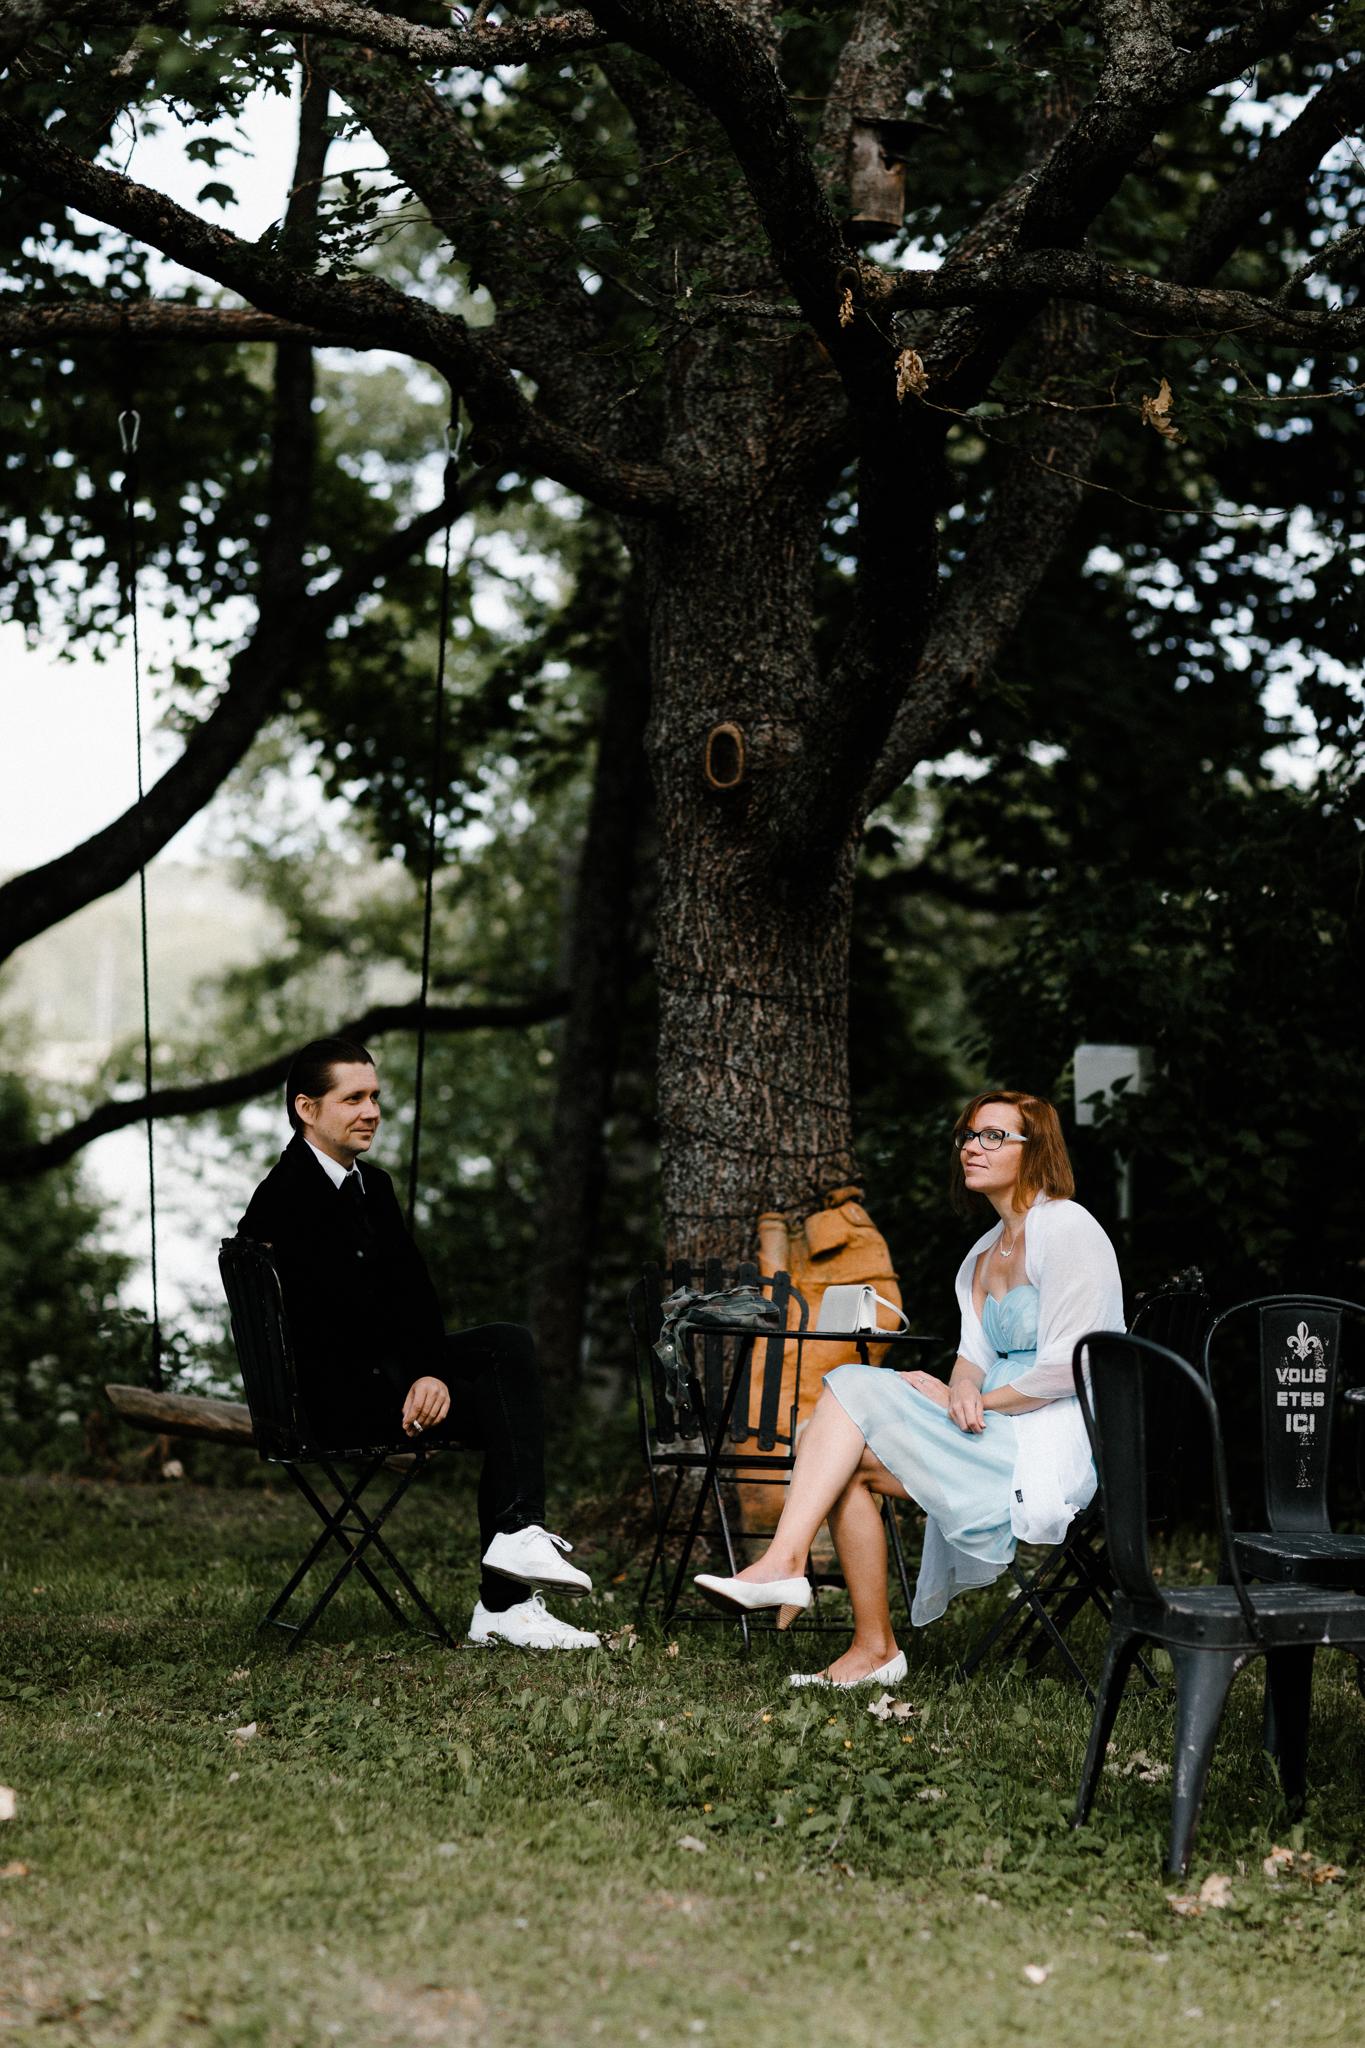 Essi + Ville   Oitbacka Gården   by Patrick Karkkolainen Wedding Photography-139.jpg